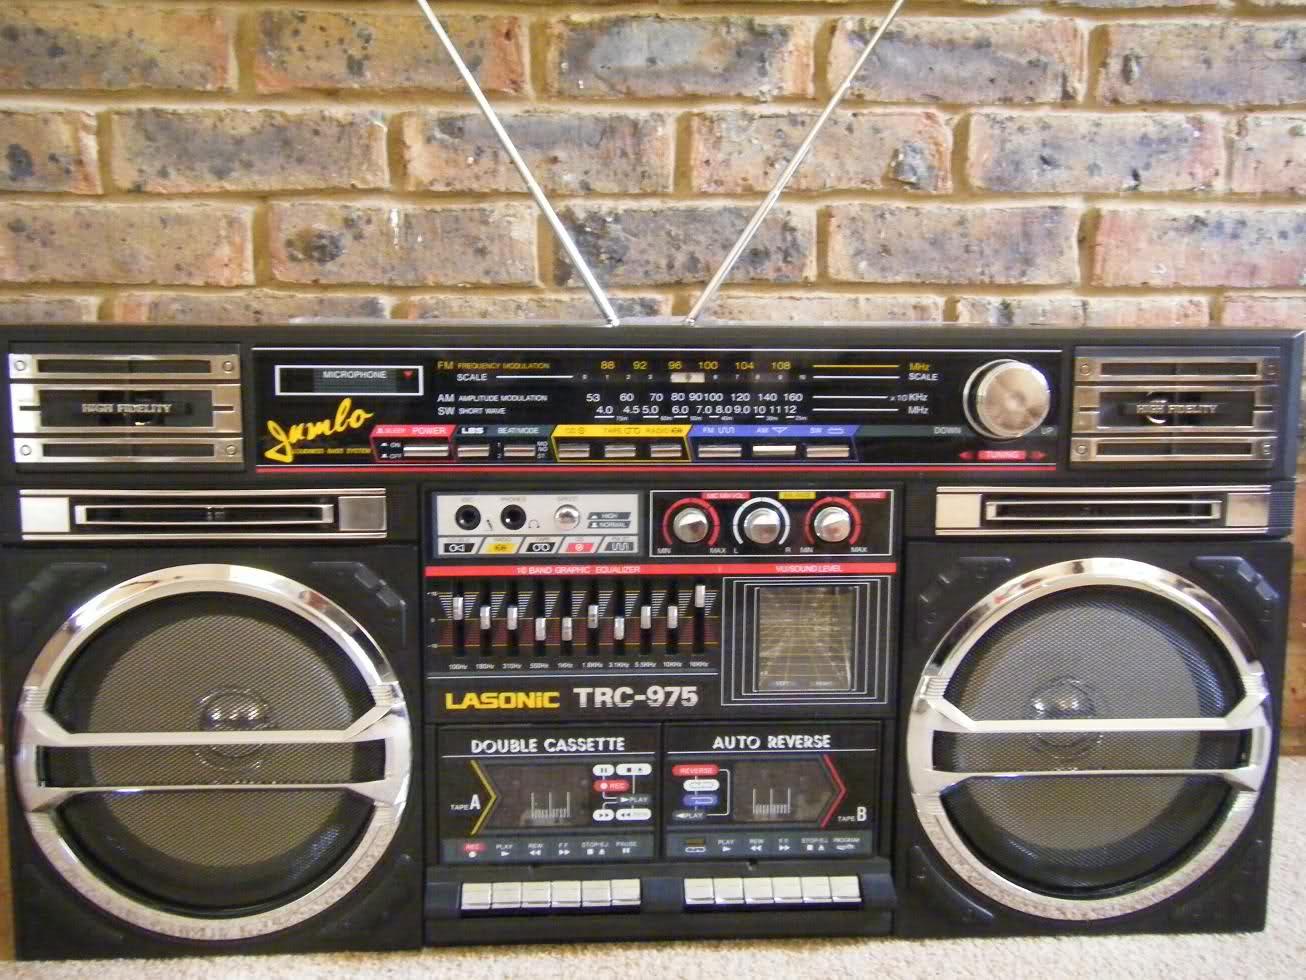 radiocasette radiocasette lasonic TRC-975